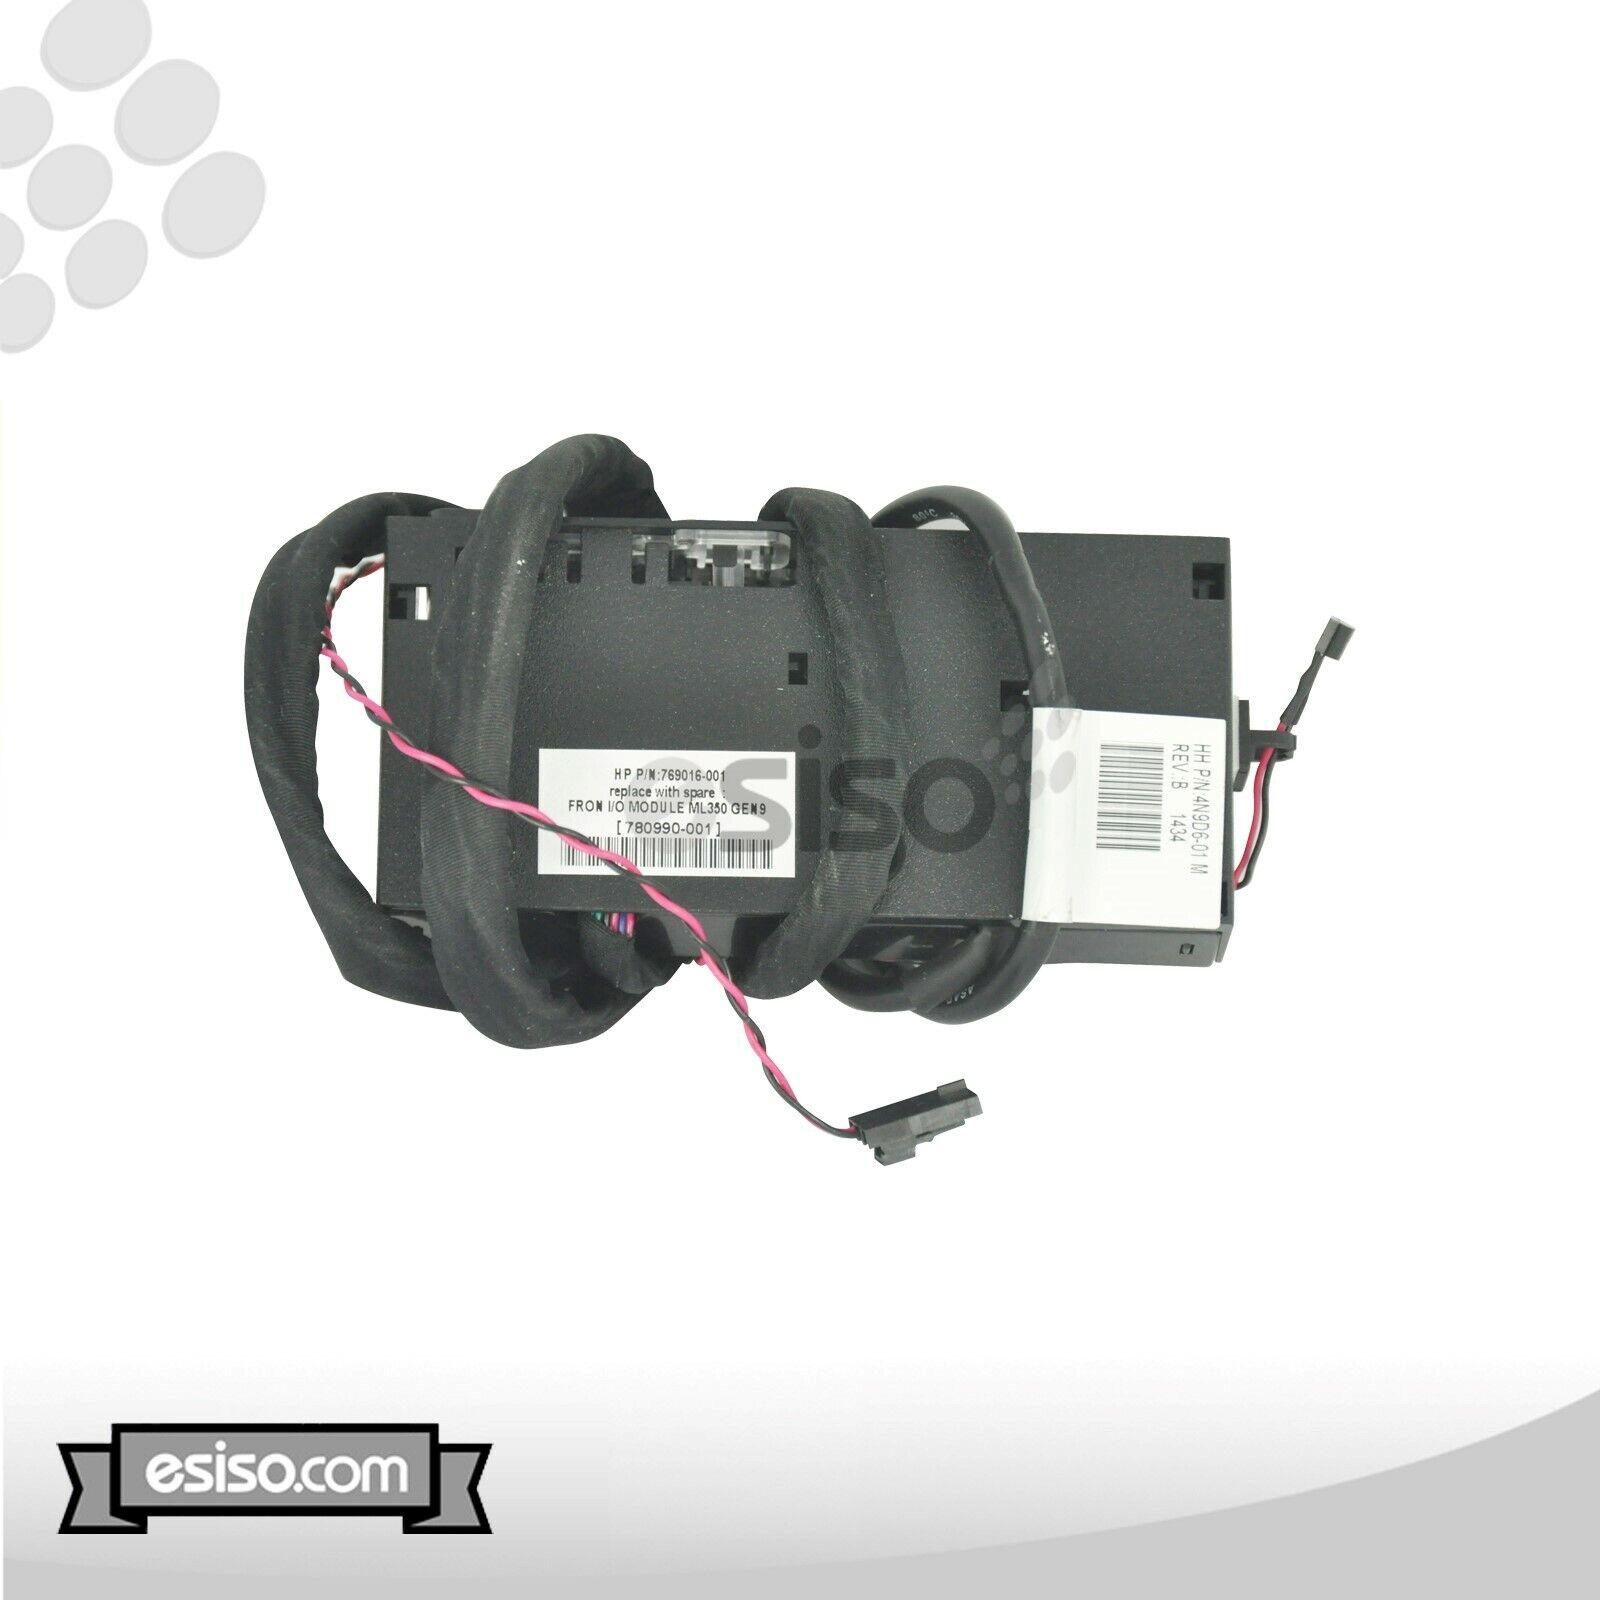 780990-001 769016-001 HPE PROLIANT ML350 G9 FRONT IO MODULE